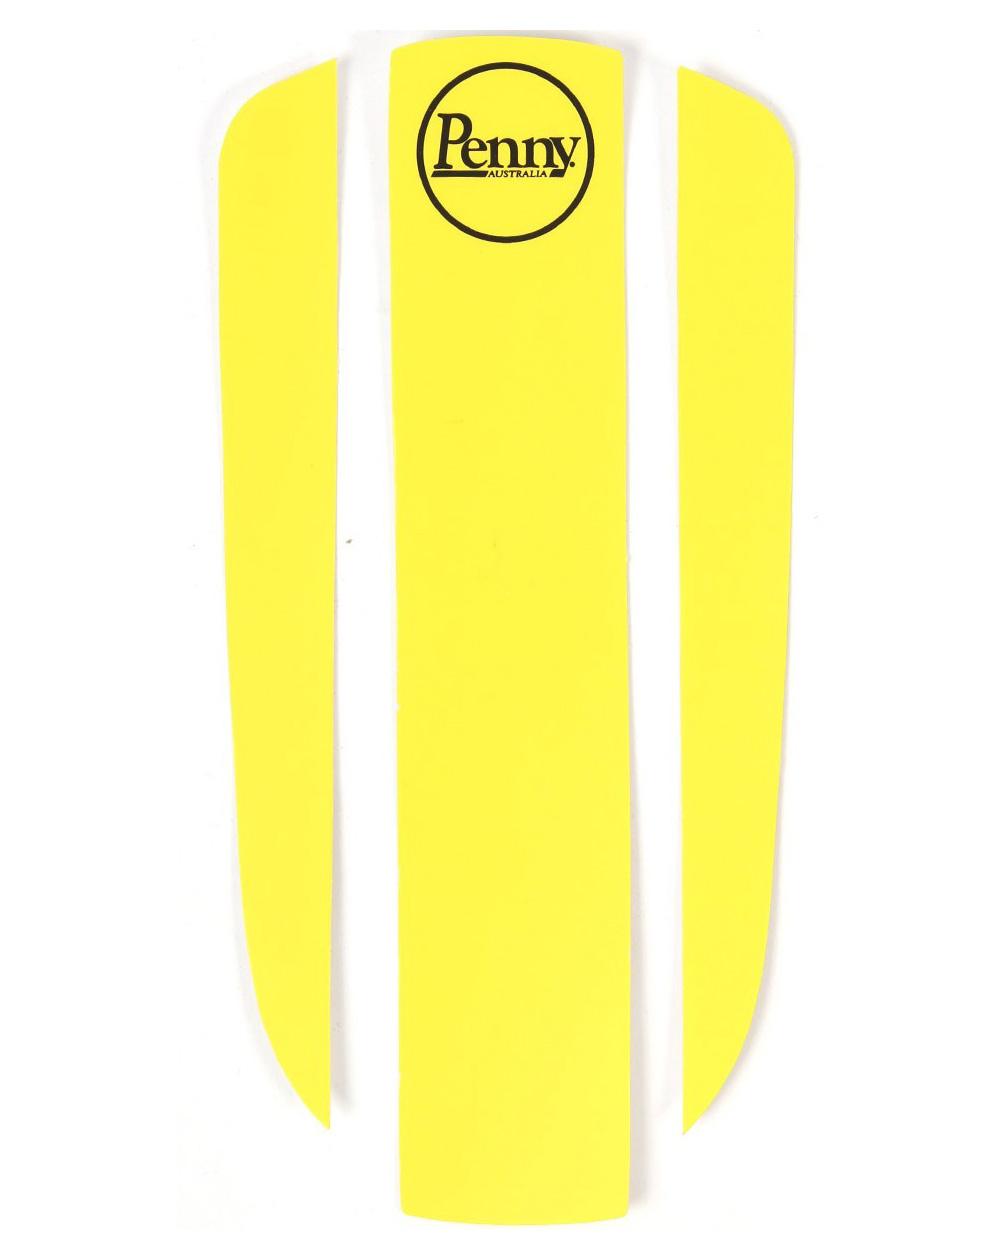 Penny Adhésifs por Plateaux Yellow 22-inch